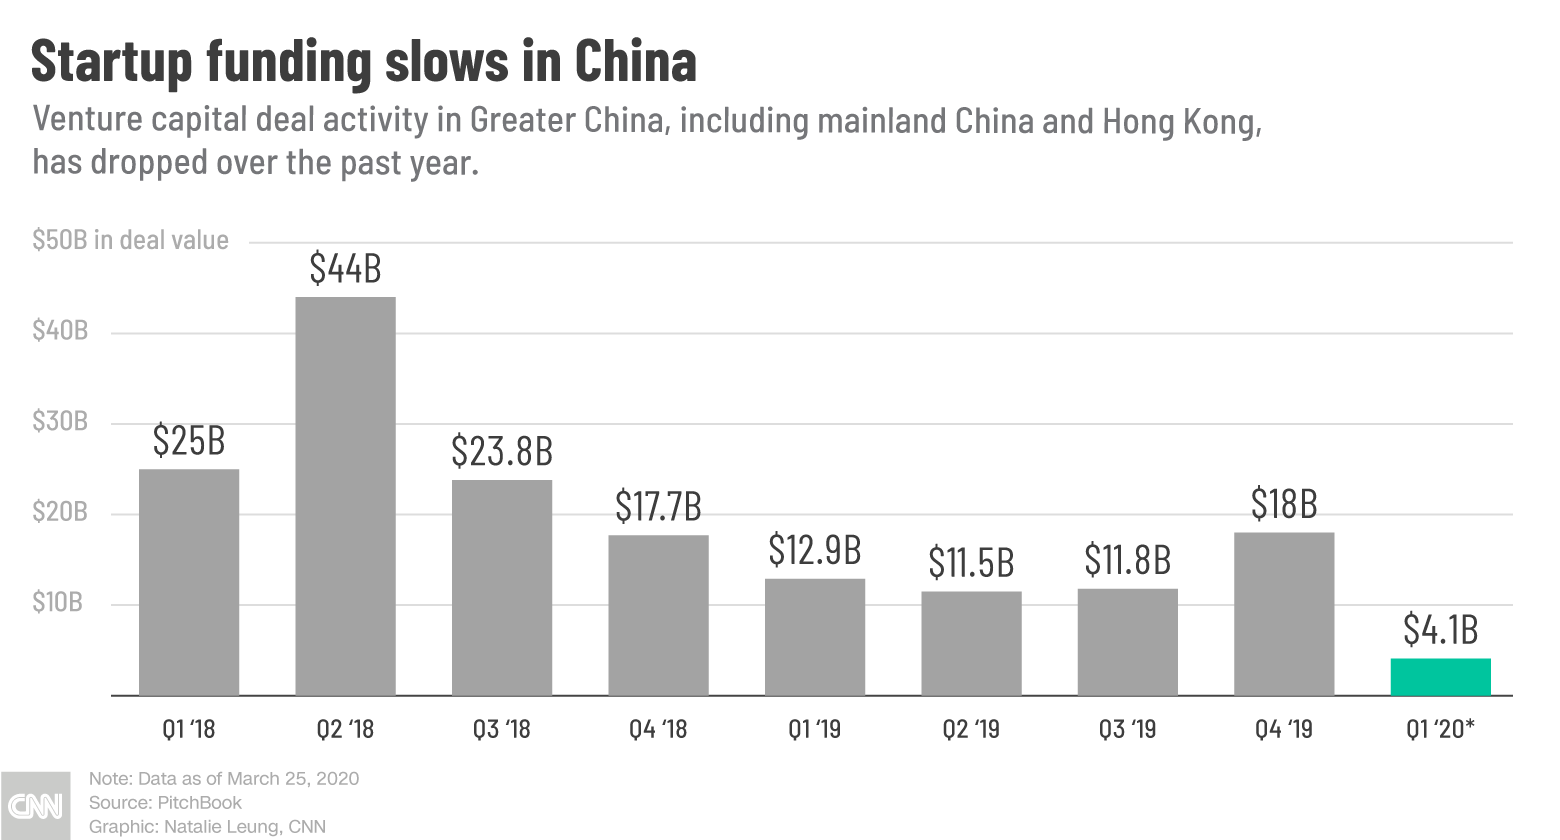 Chinese startups were already struggling to raise money. The coronavirus may be the last straw